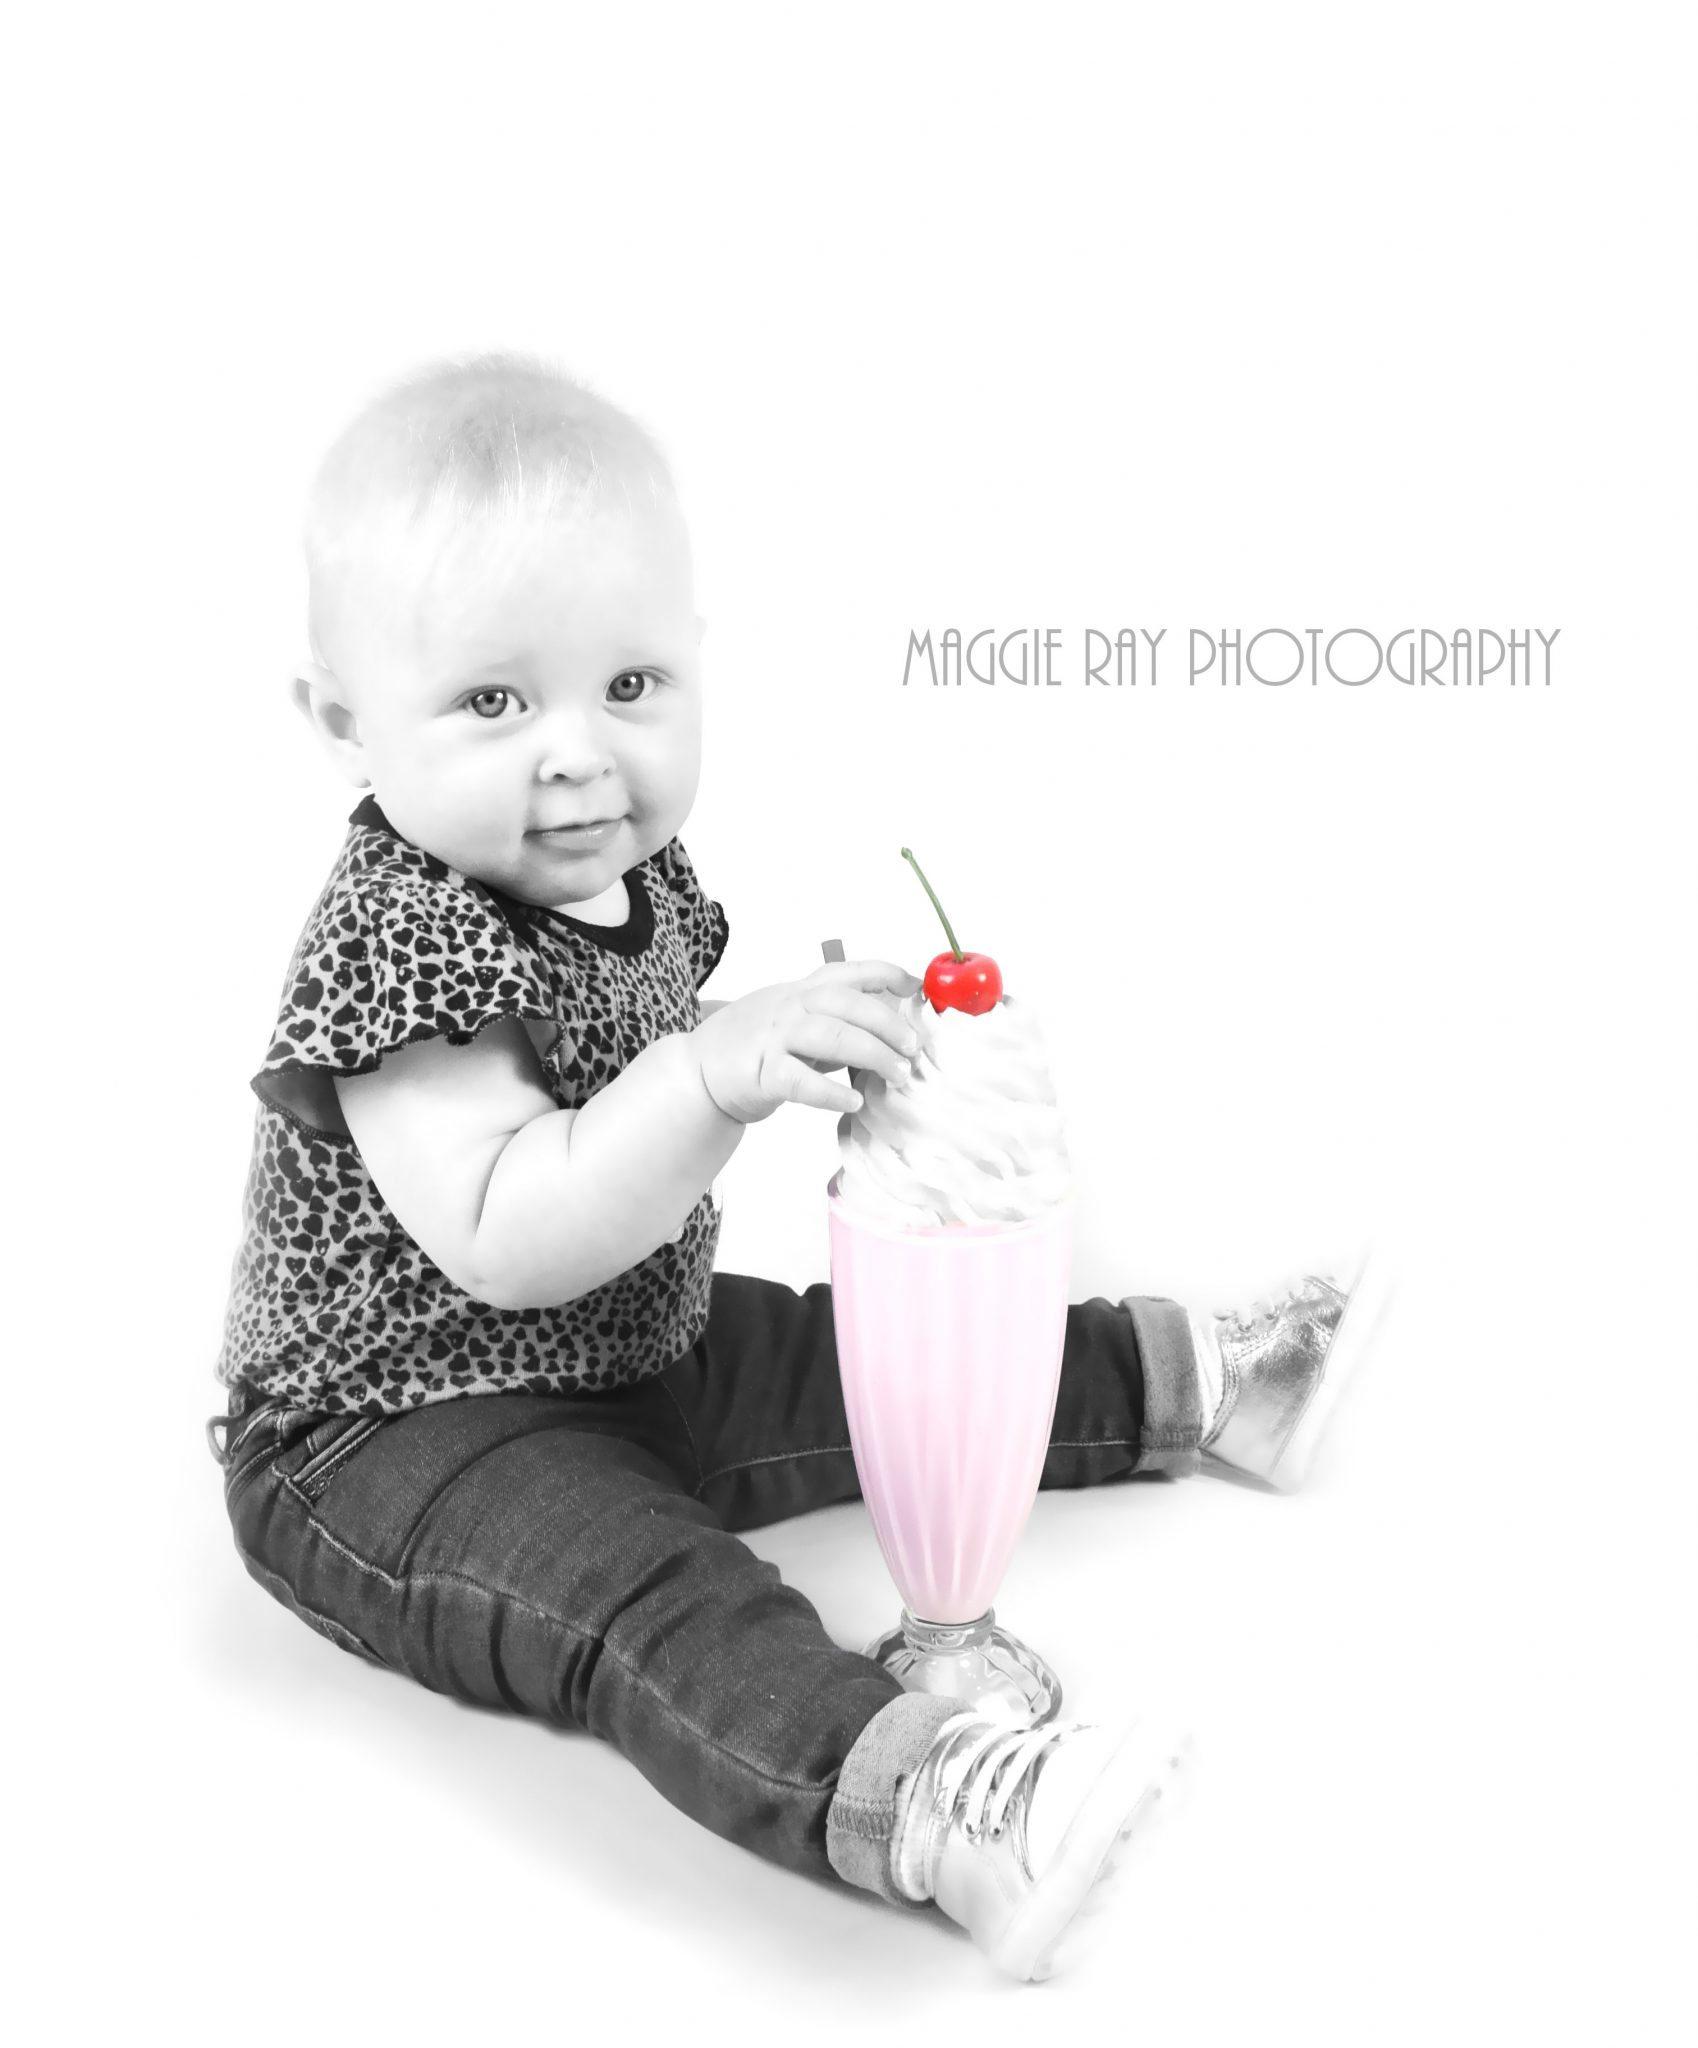 Maggie Ray Pin Up & Retro Photography Studio